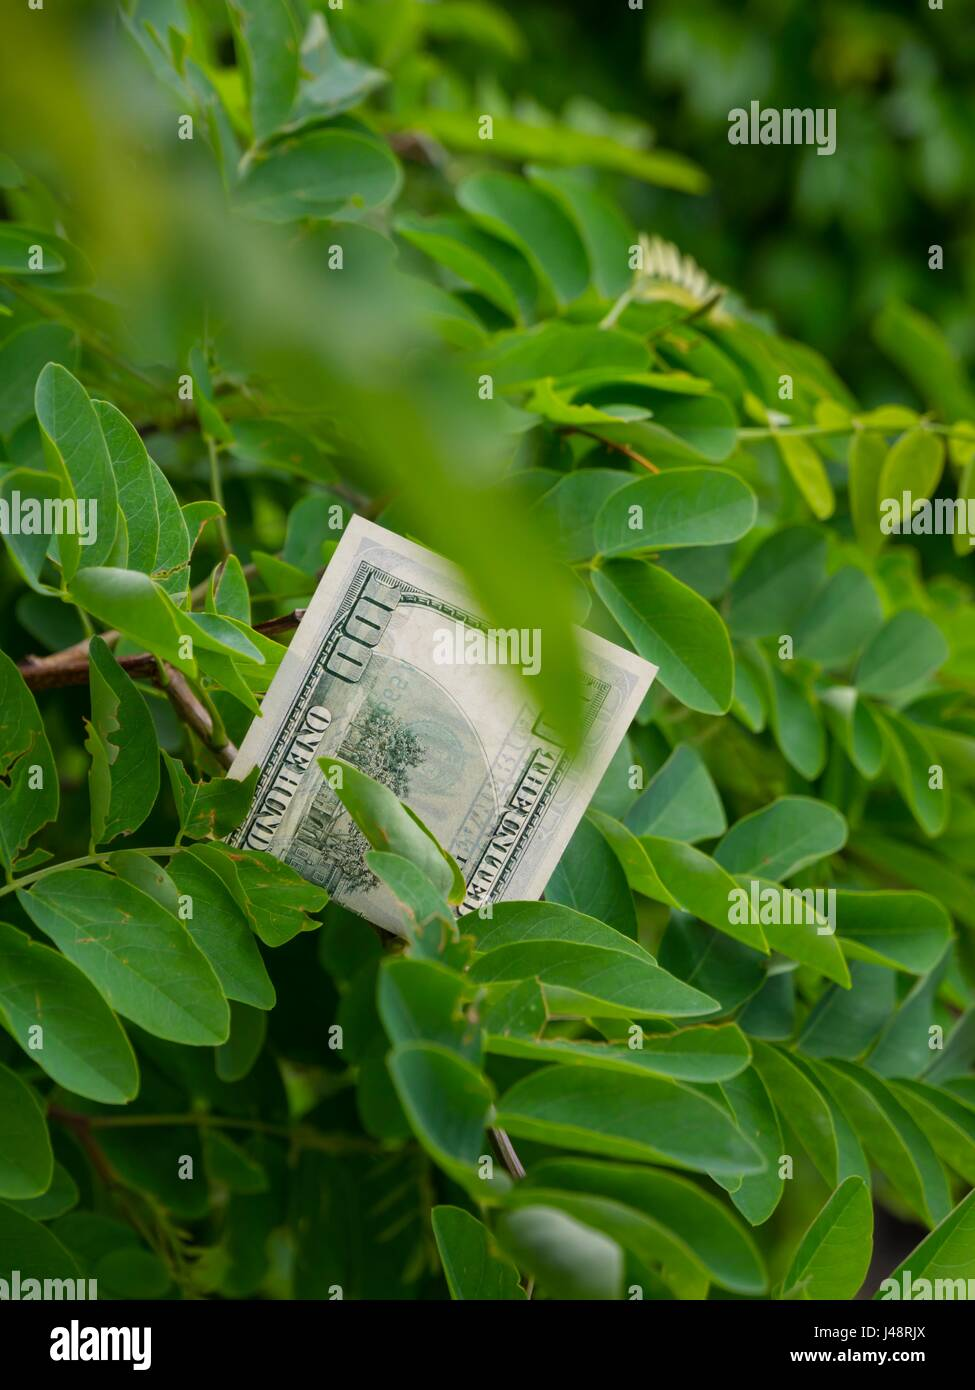 Money growing on tree environmental environment - Stock Image